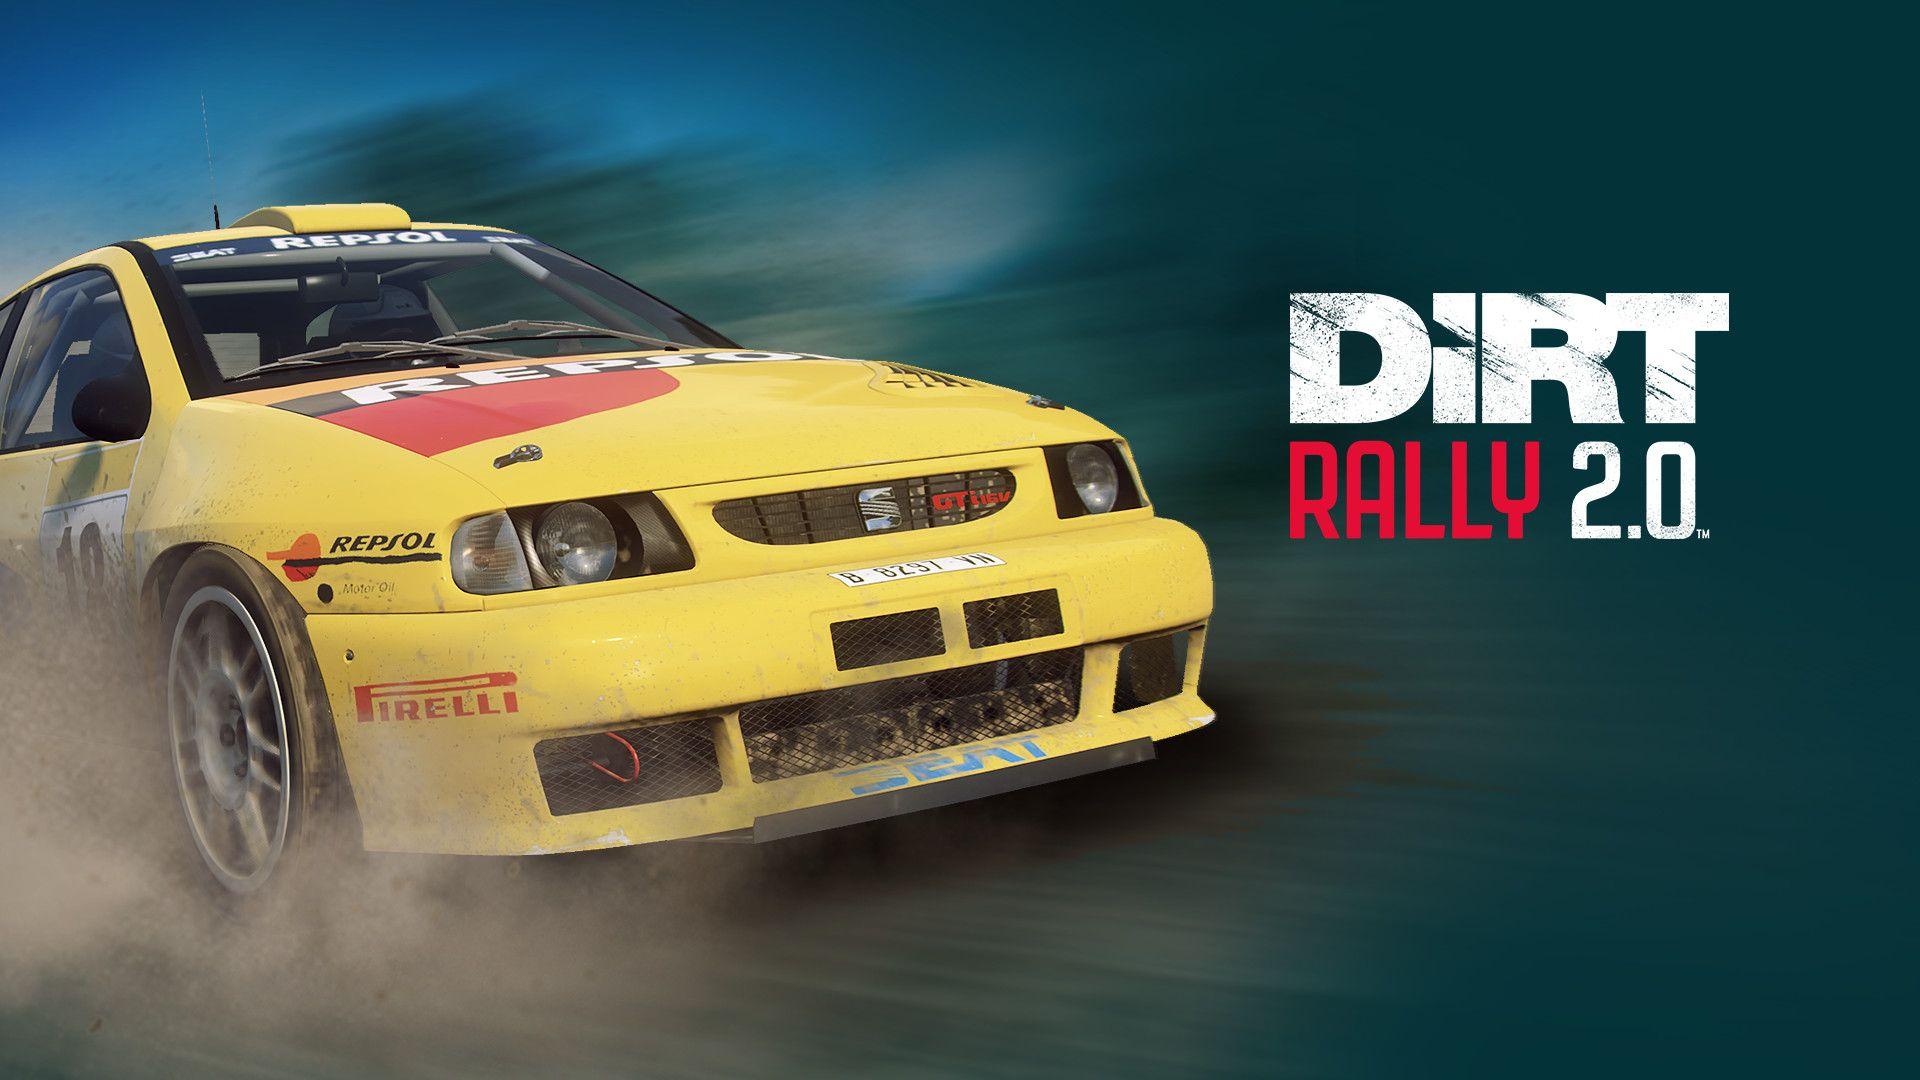 DiRT Rally 2.0 - Seat Ibiza Kit Car